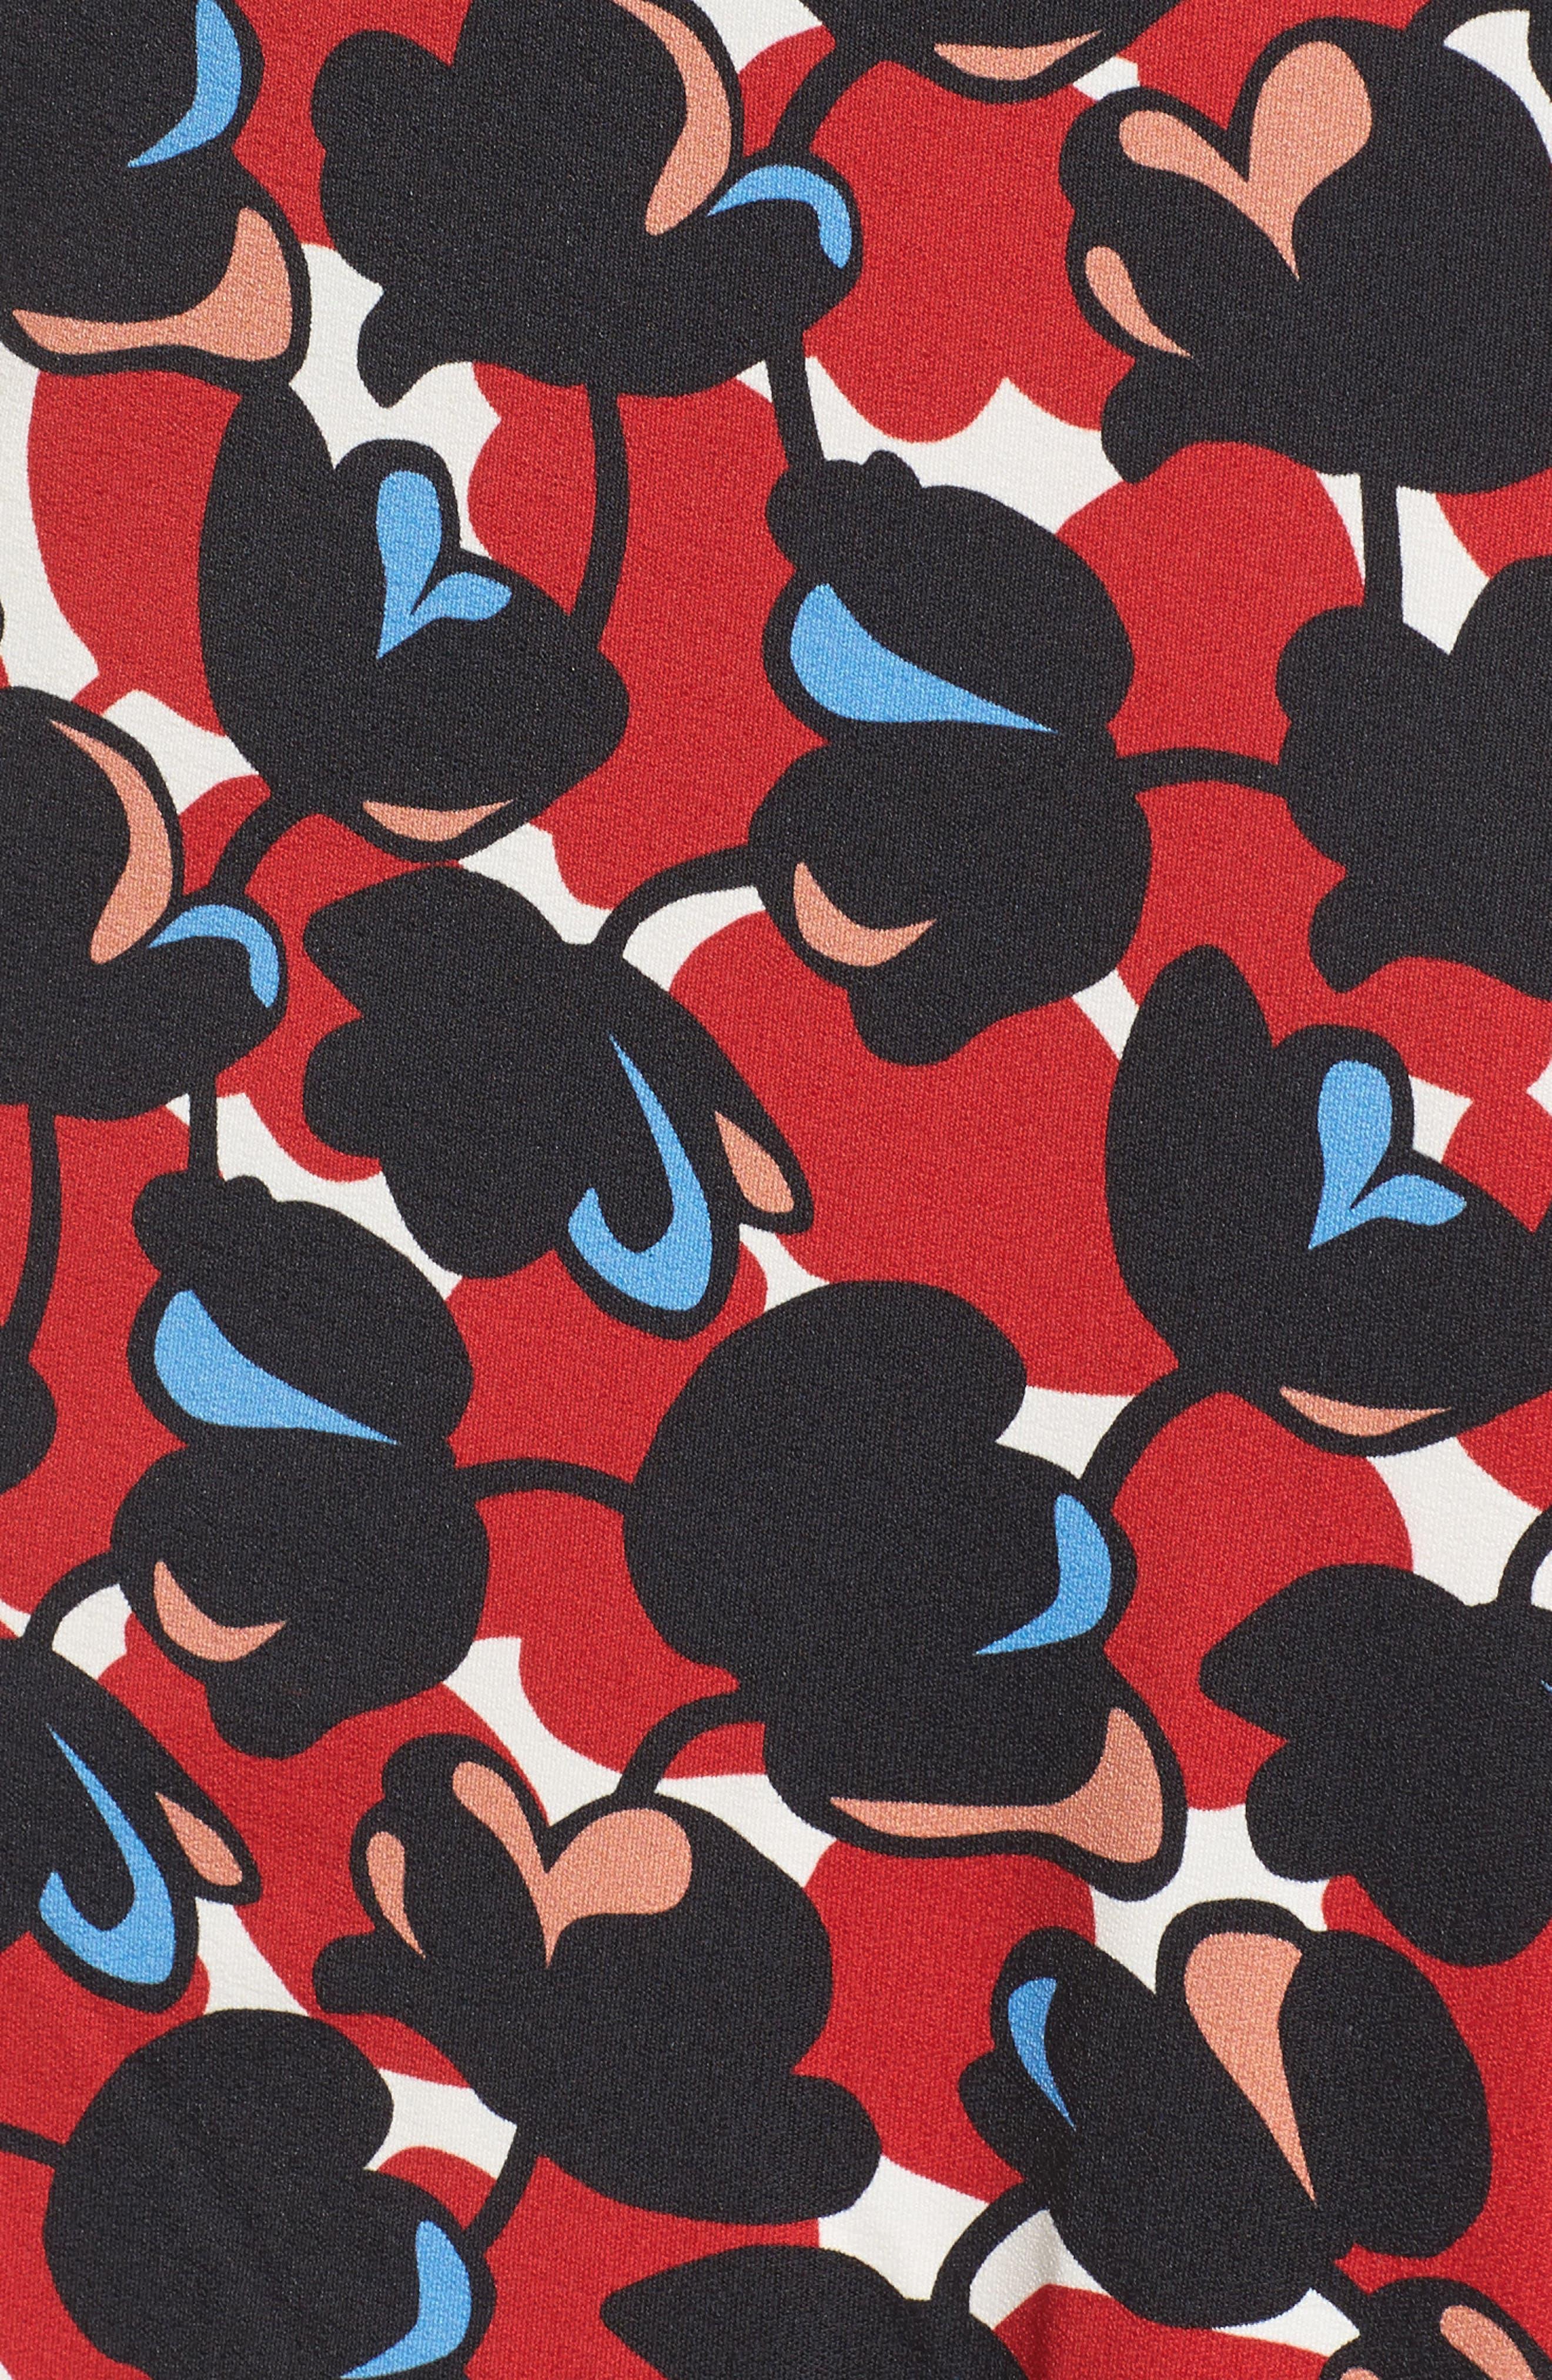 Eleika Print Jersey Sheath Dress,                             Alternate thumbnail 5, color,                             Multicolor Flower Print